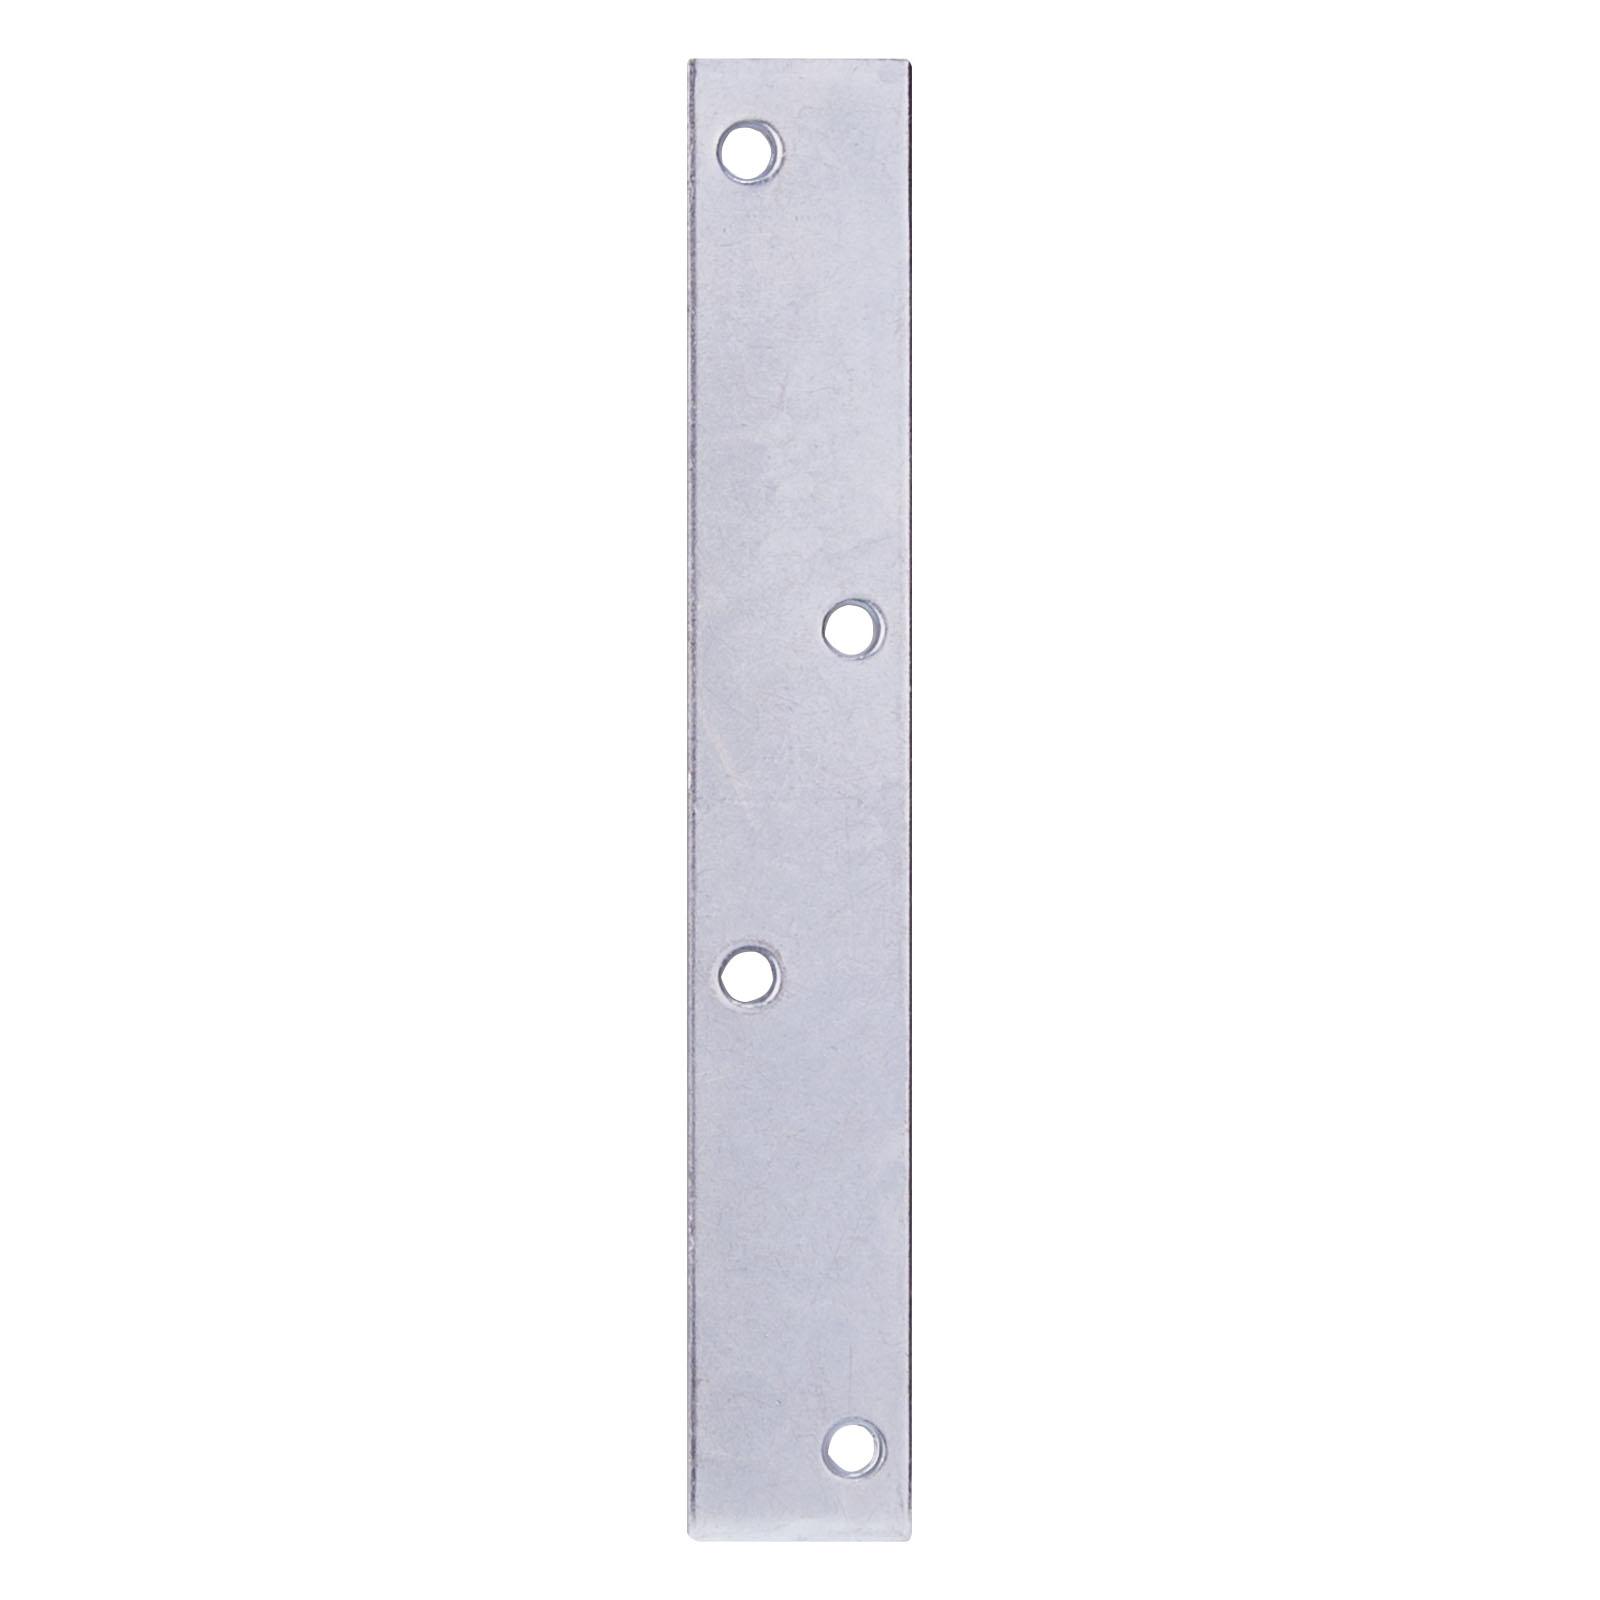 Picture of ProSource MP-Z08-013L Mending Plate, 8 in L, 1-1/4 in W, Steel, Zinc